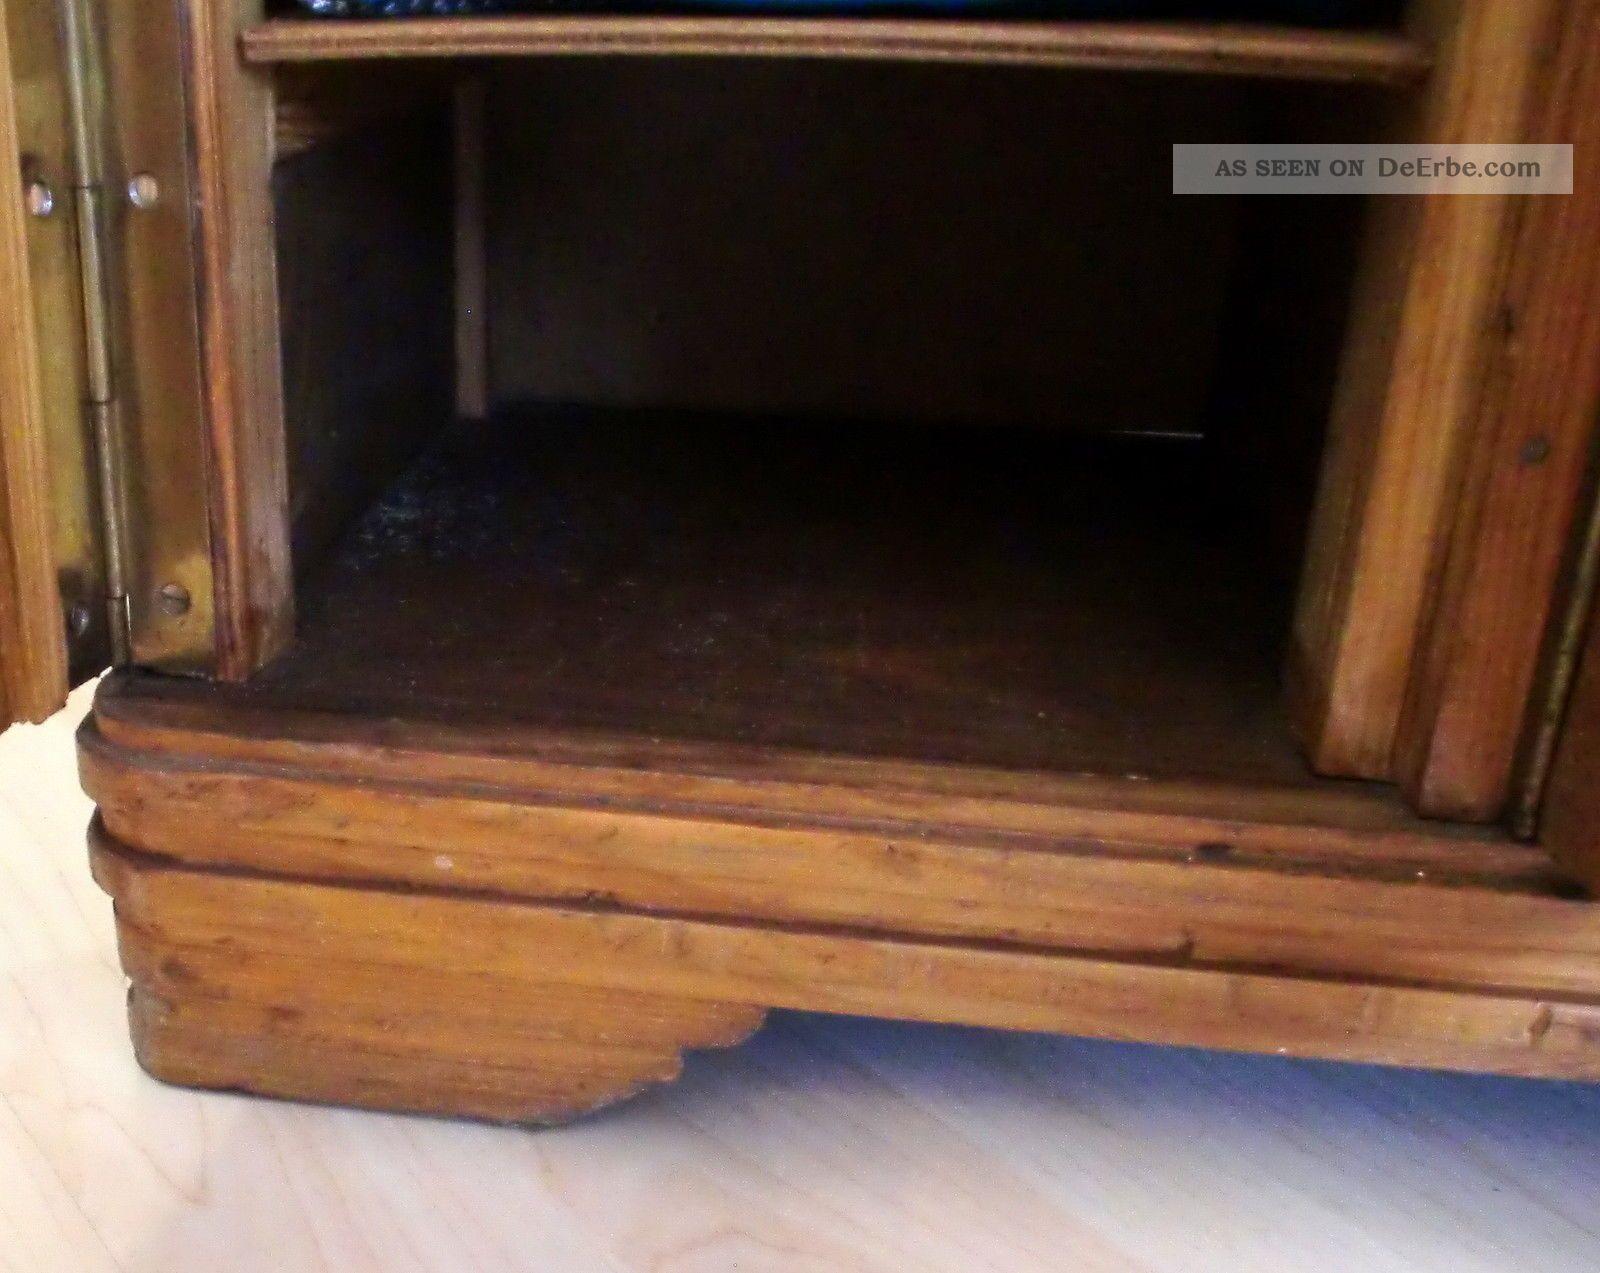 Charmant Puppenschrank Holz Fotos - Die Schlafzimmerideen - kruloei.info